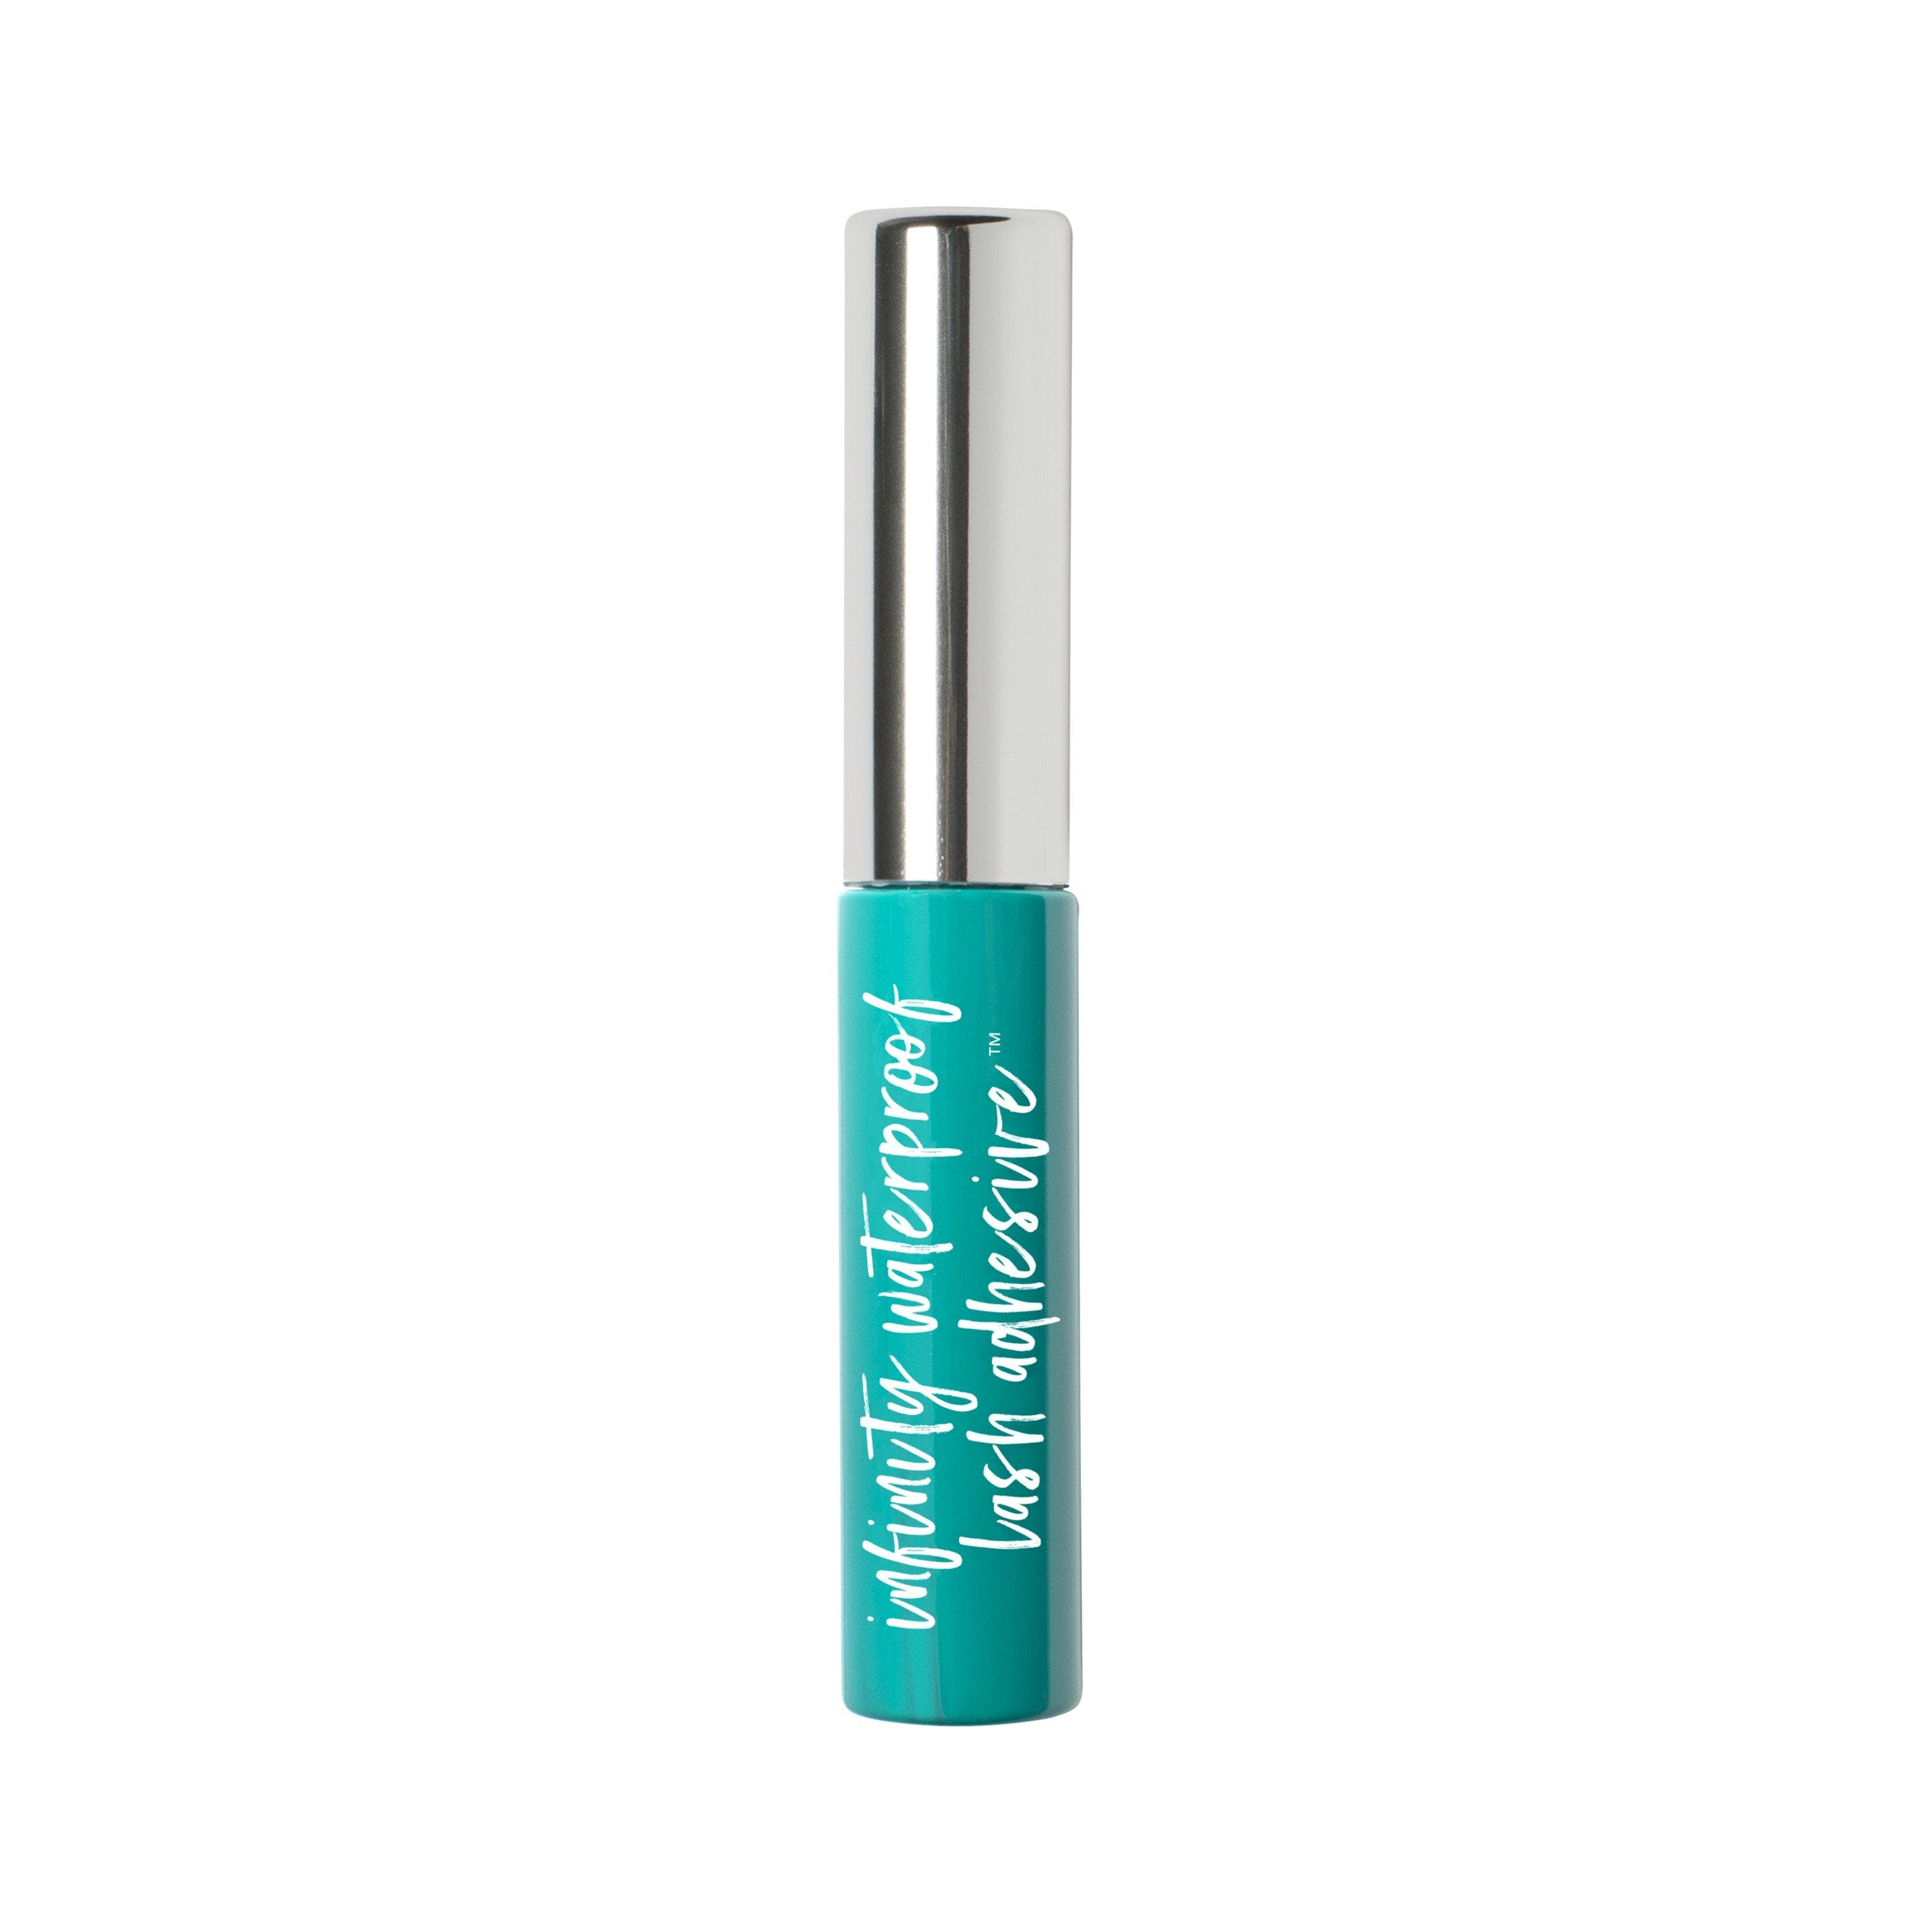 Infinity Waterproof Lash Adhesive™ product image